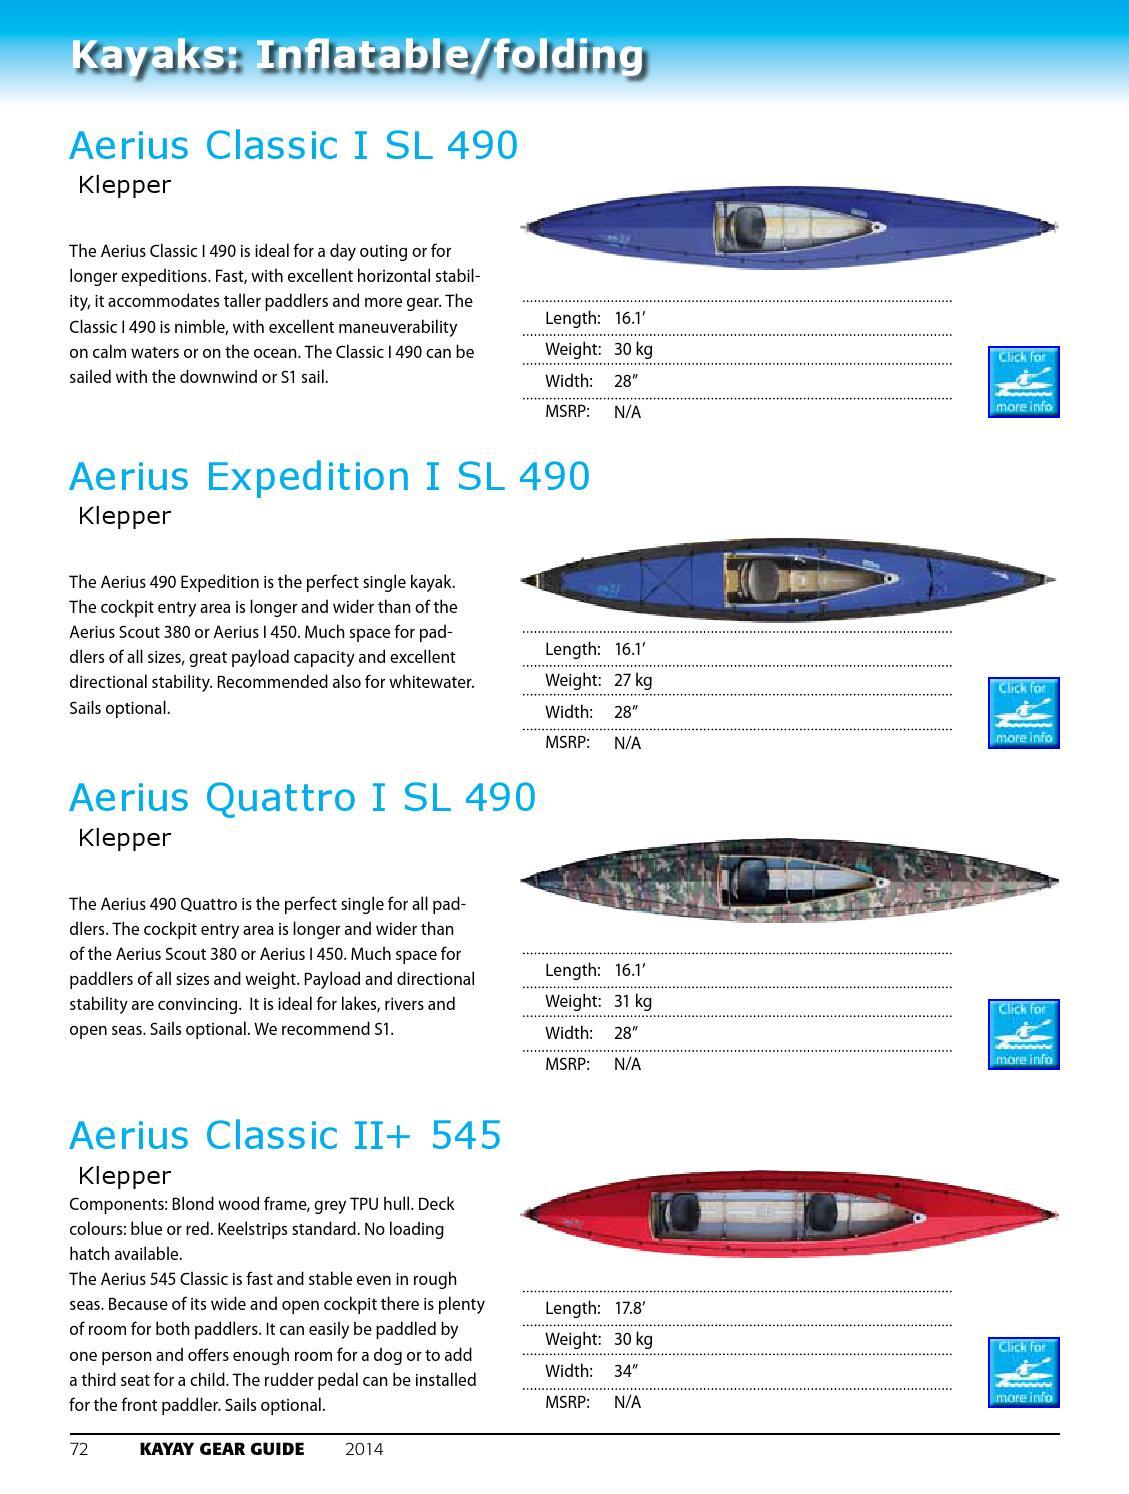 2014 Kayak Gear Guide by Wild Coast Publishing - issuu